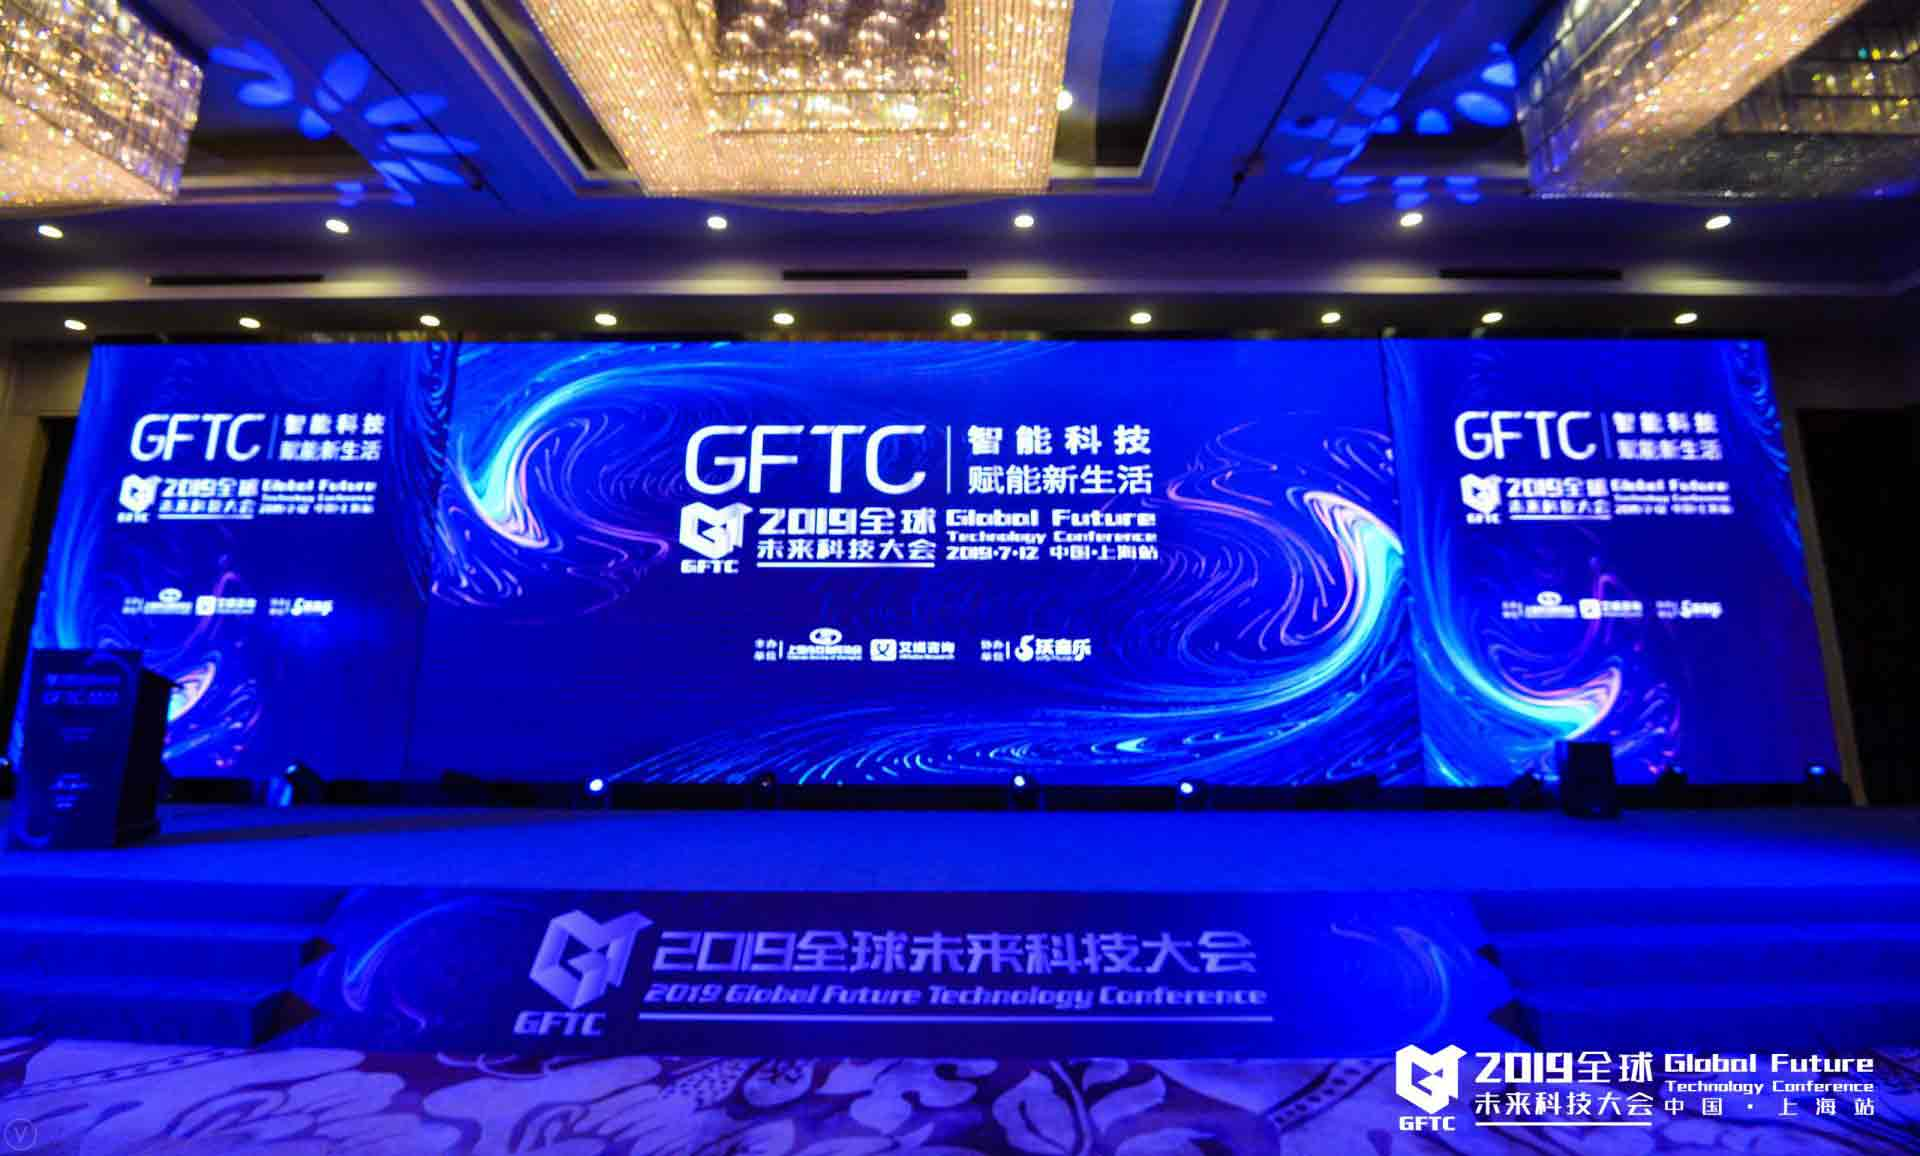 GFTC2019全球未来科技大会(上海站)开幕!聚焦5G应用、短视频营销、社交电商等话题